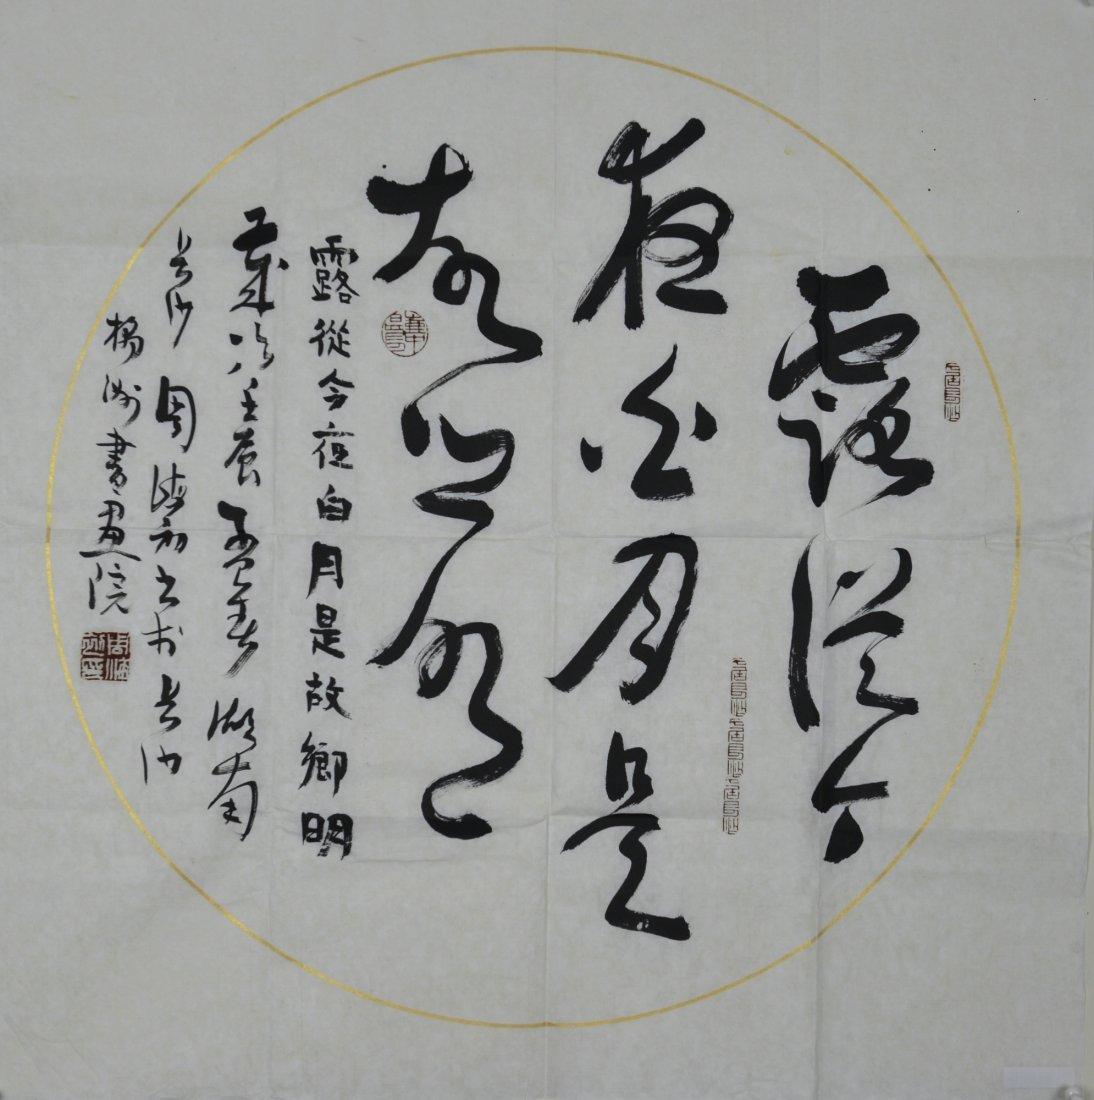 3: Zhou Haichu Chinese Modern Script Calligraphy